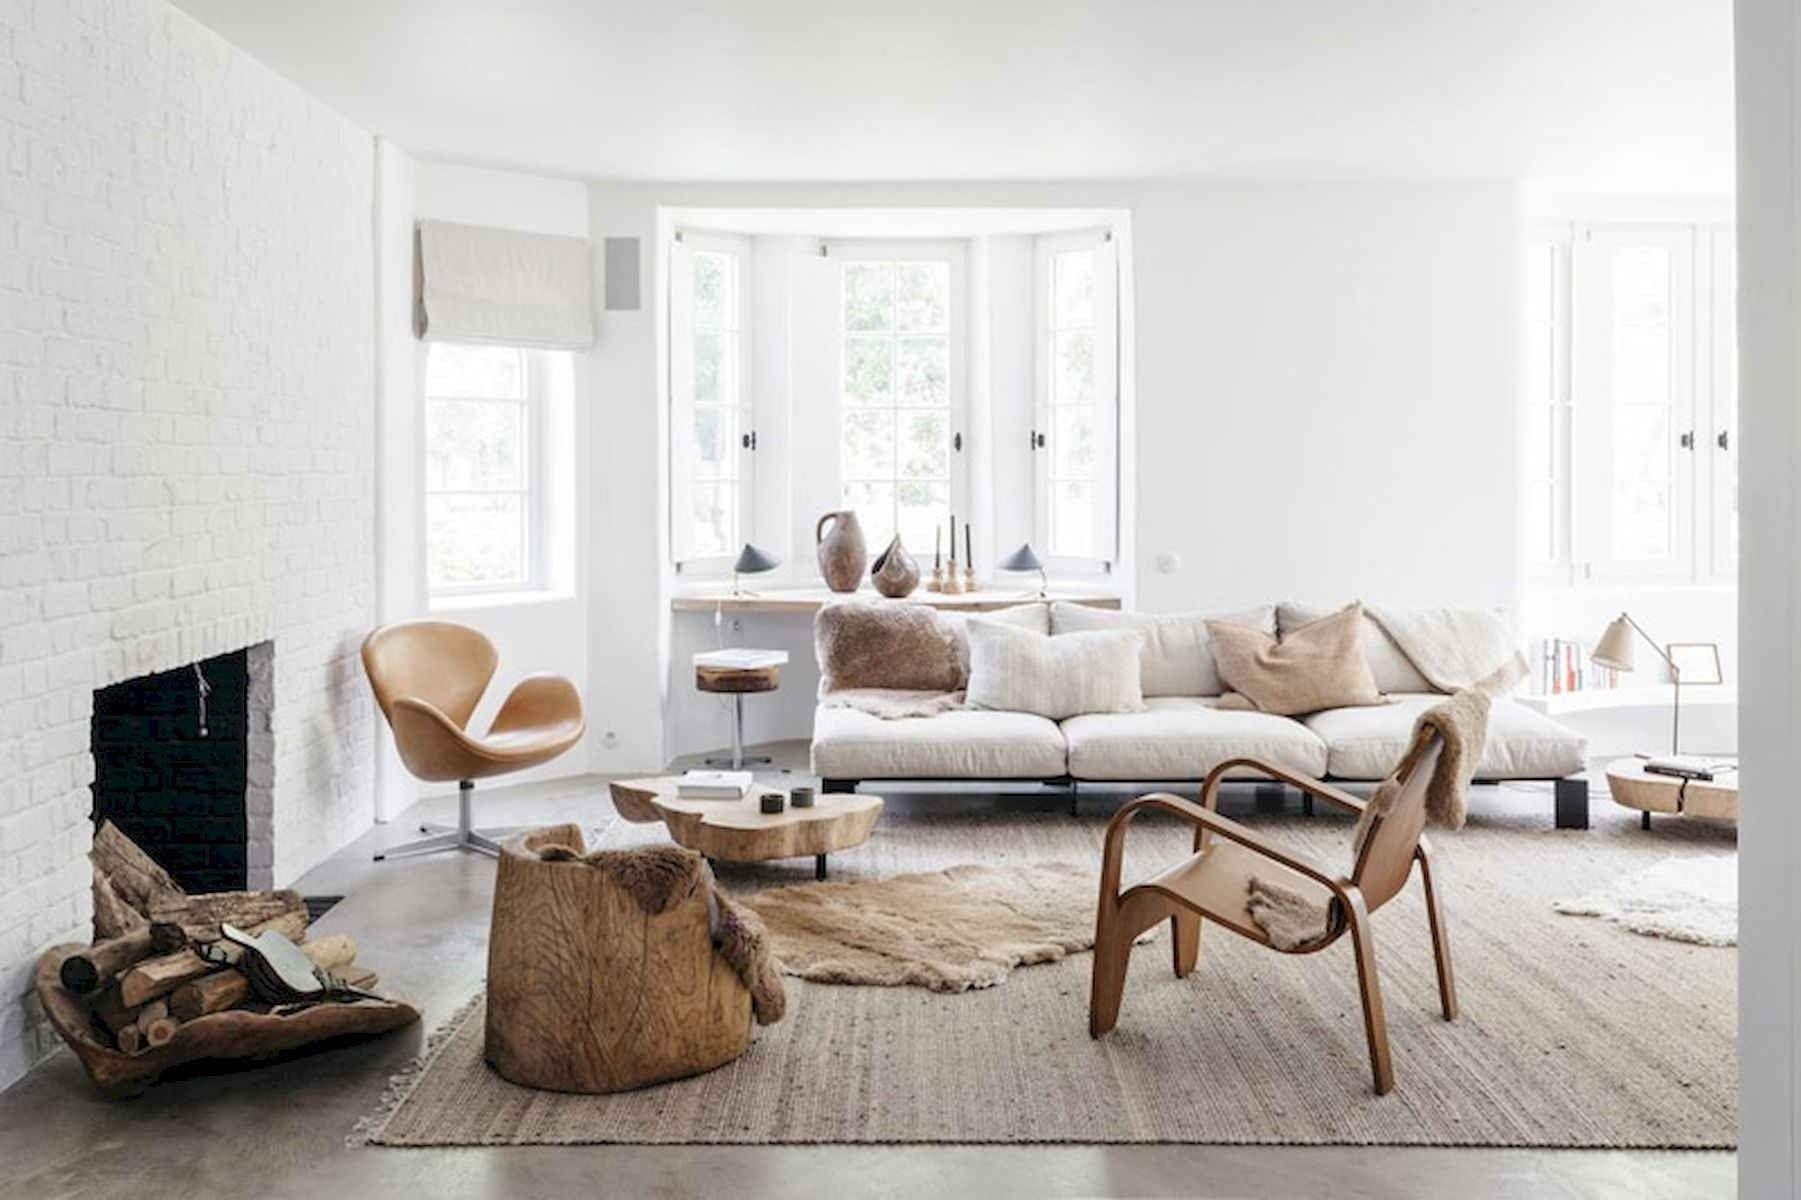 60 Modern Farmhouse Living Room Decor Ideas 32 In 2020 Scandinavian Design Living Room Living Room Scandinavian Farmhouse Decor Living Room #scandinavian #farmhouse #living #room